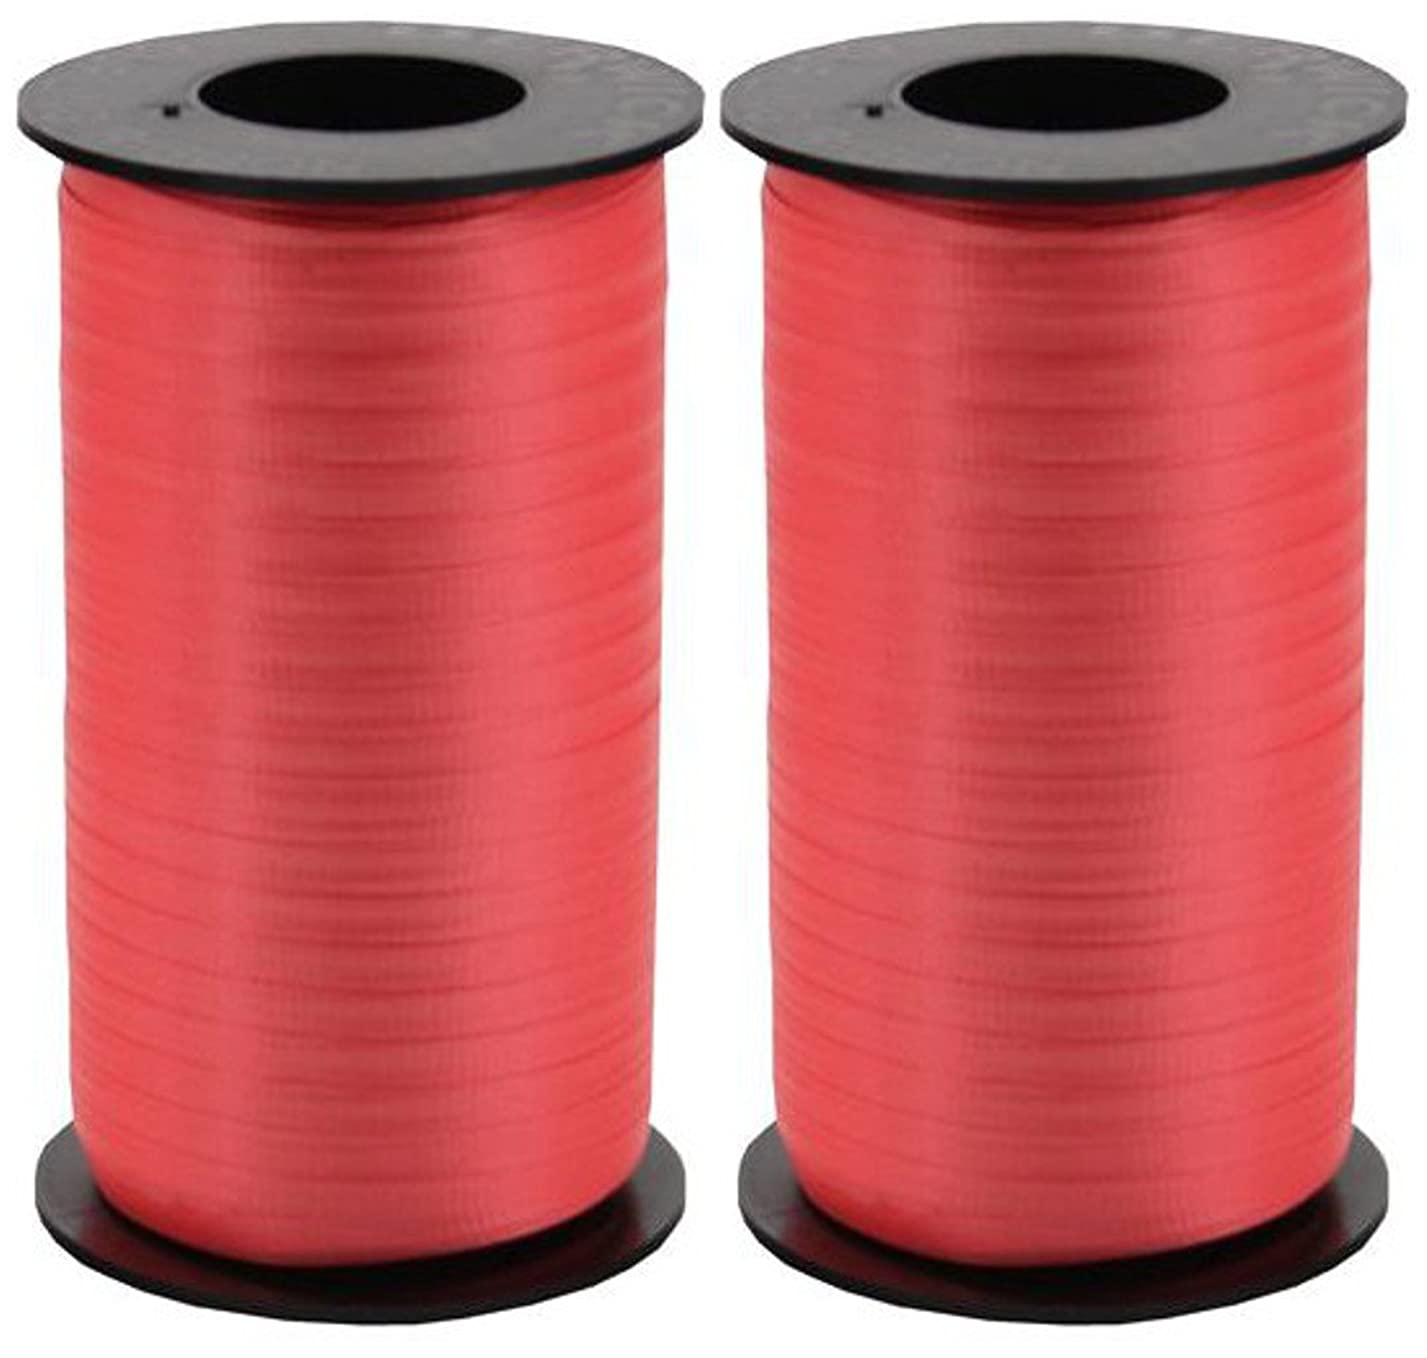 2-Pack - Berwick Splendorette Crimped Curling Ribbon, 3/16-Inch Wide by 500-Yard Spools, Red hu87191773